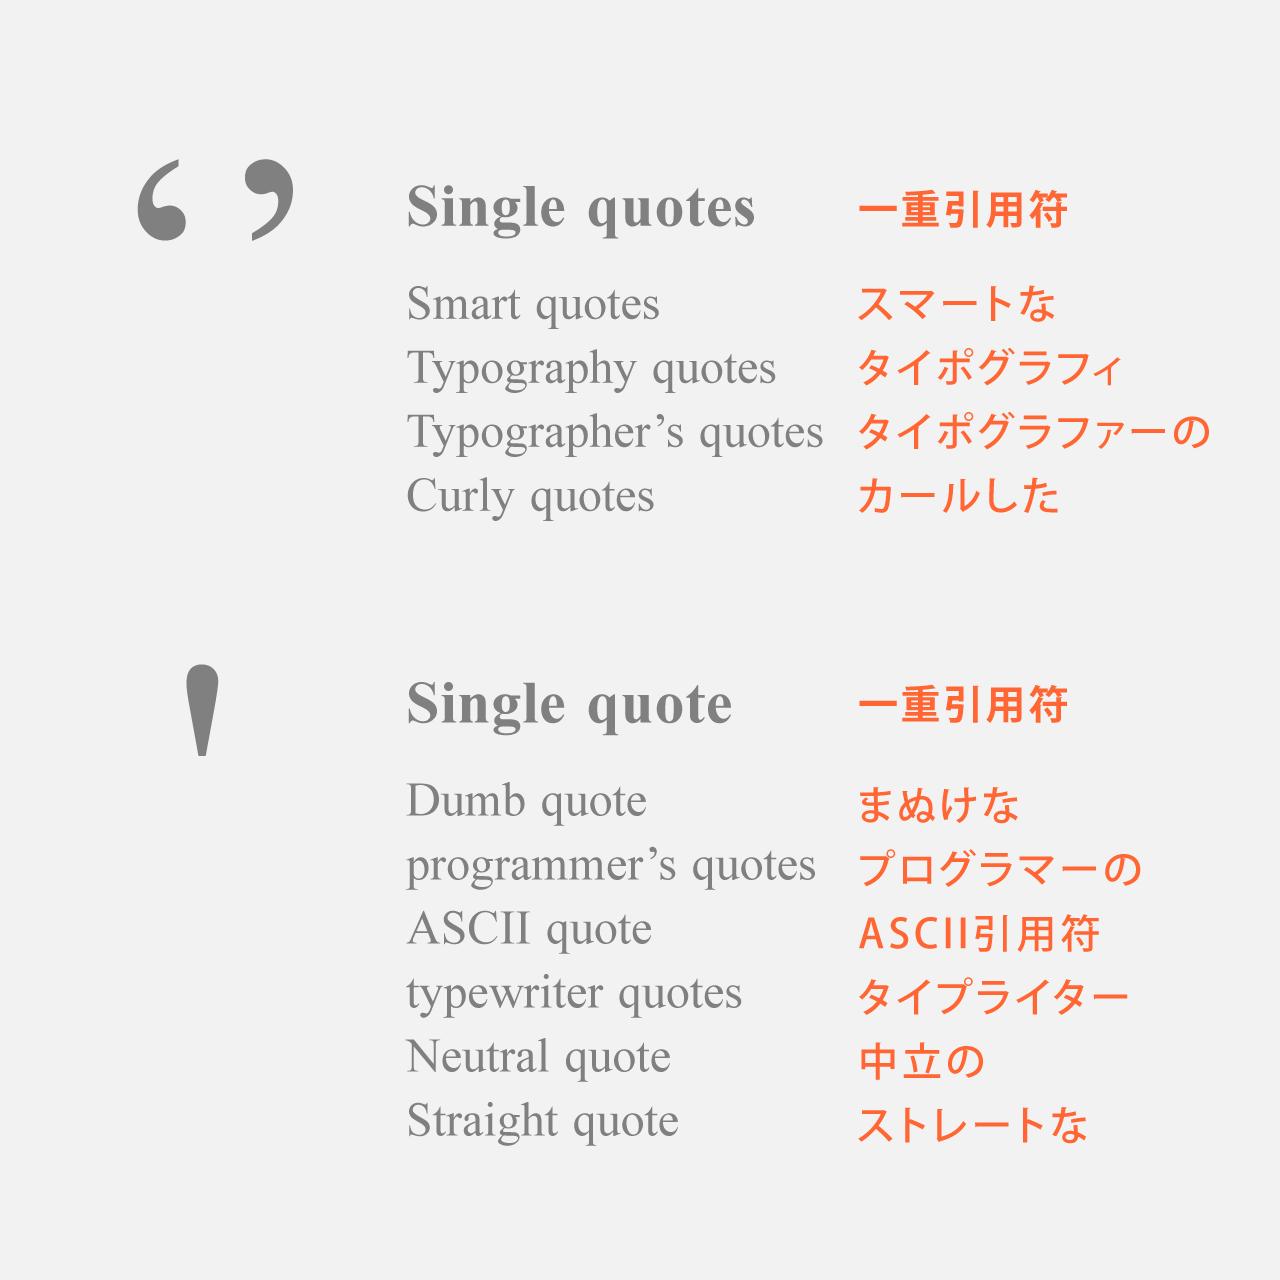 apostrophe quotes name 2x 世界標準のスペック英語